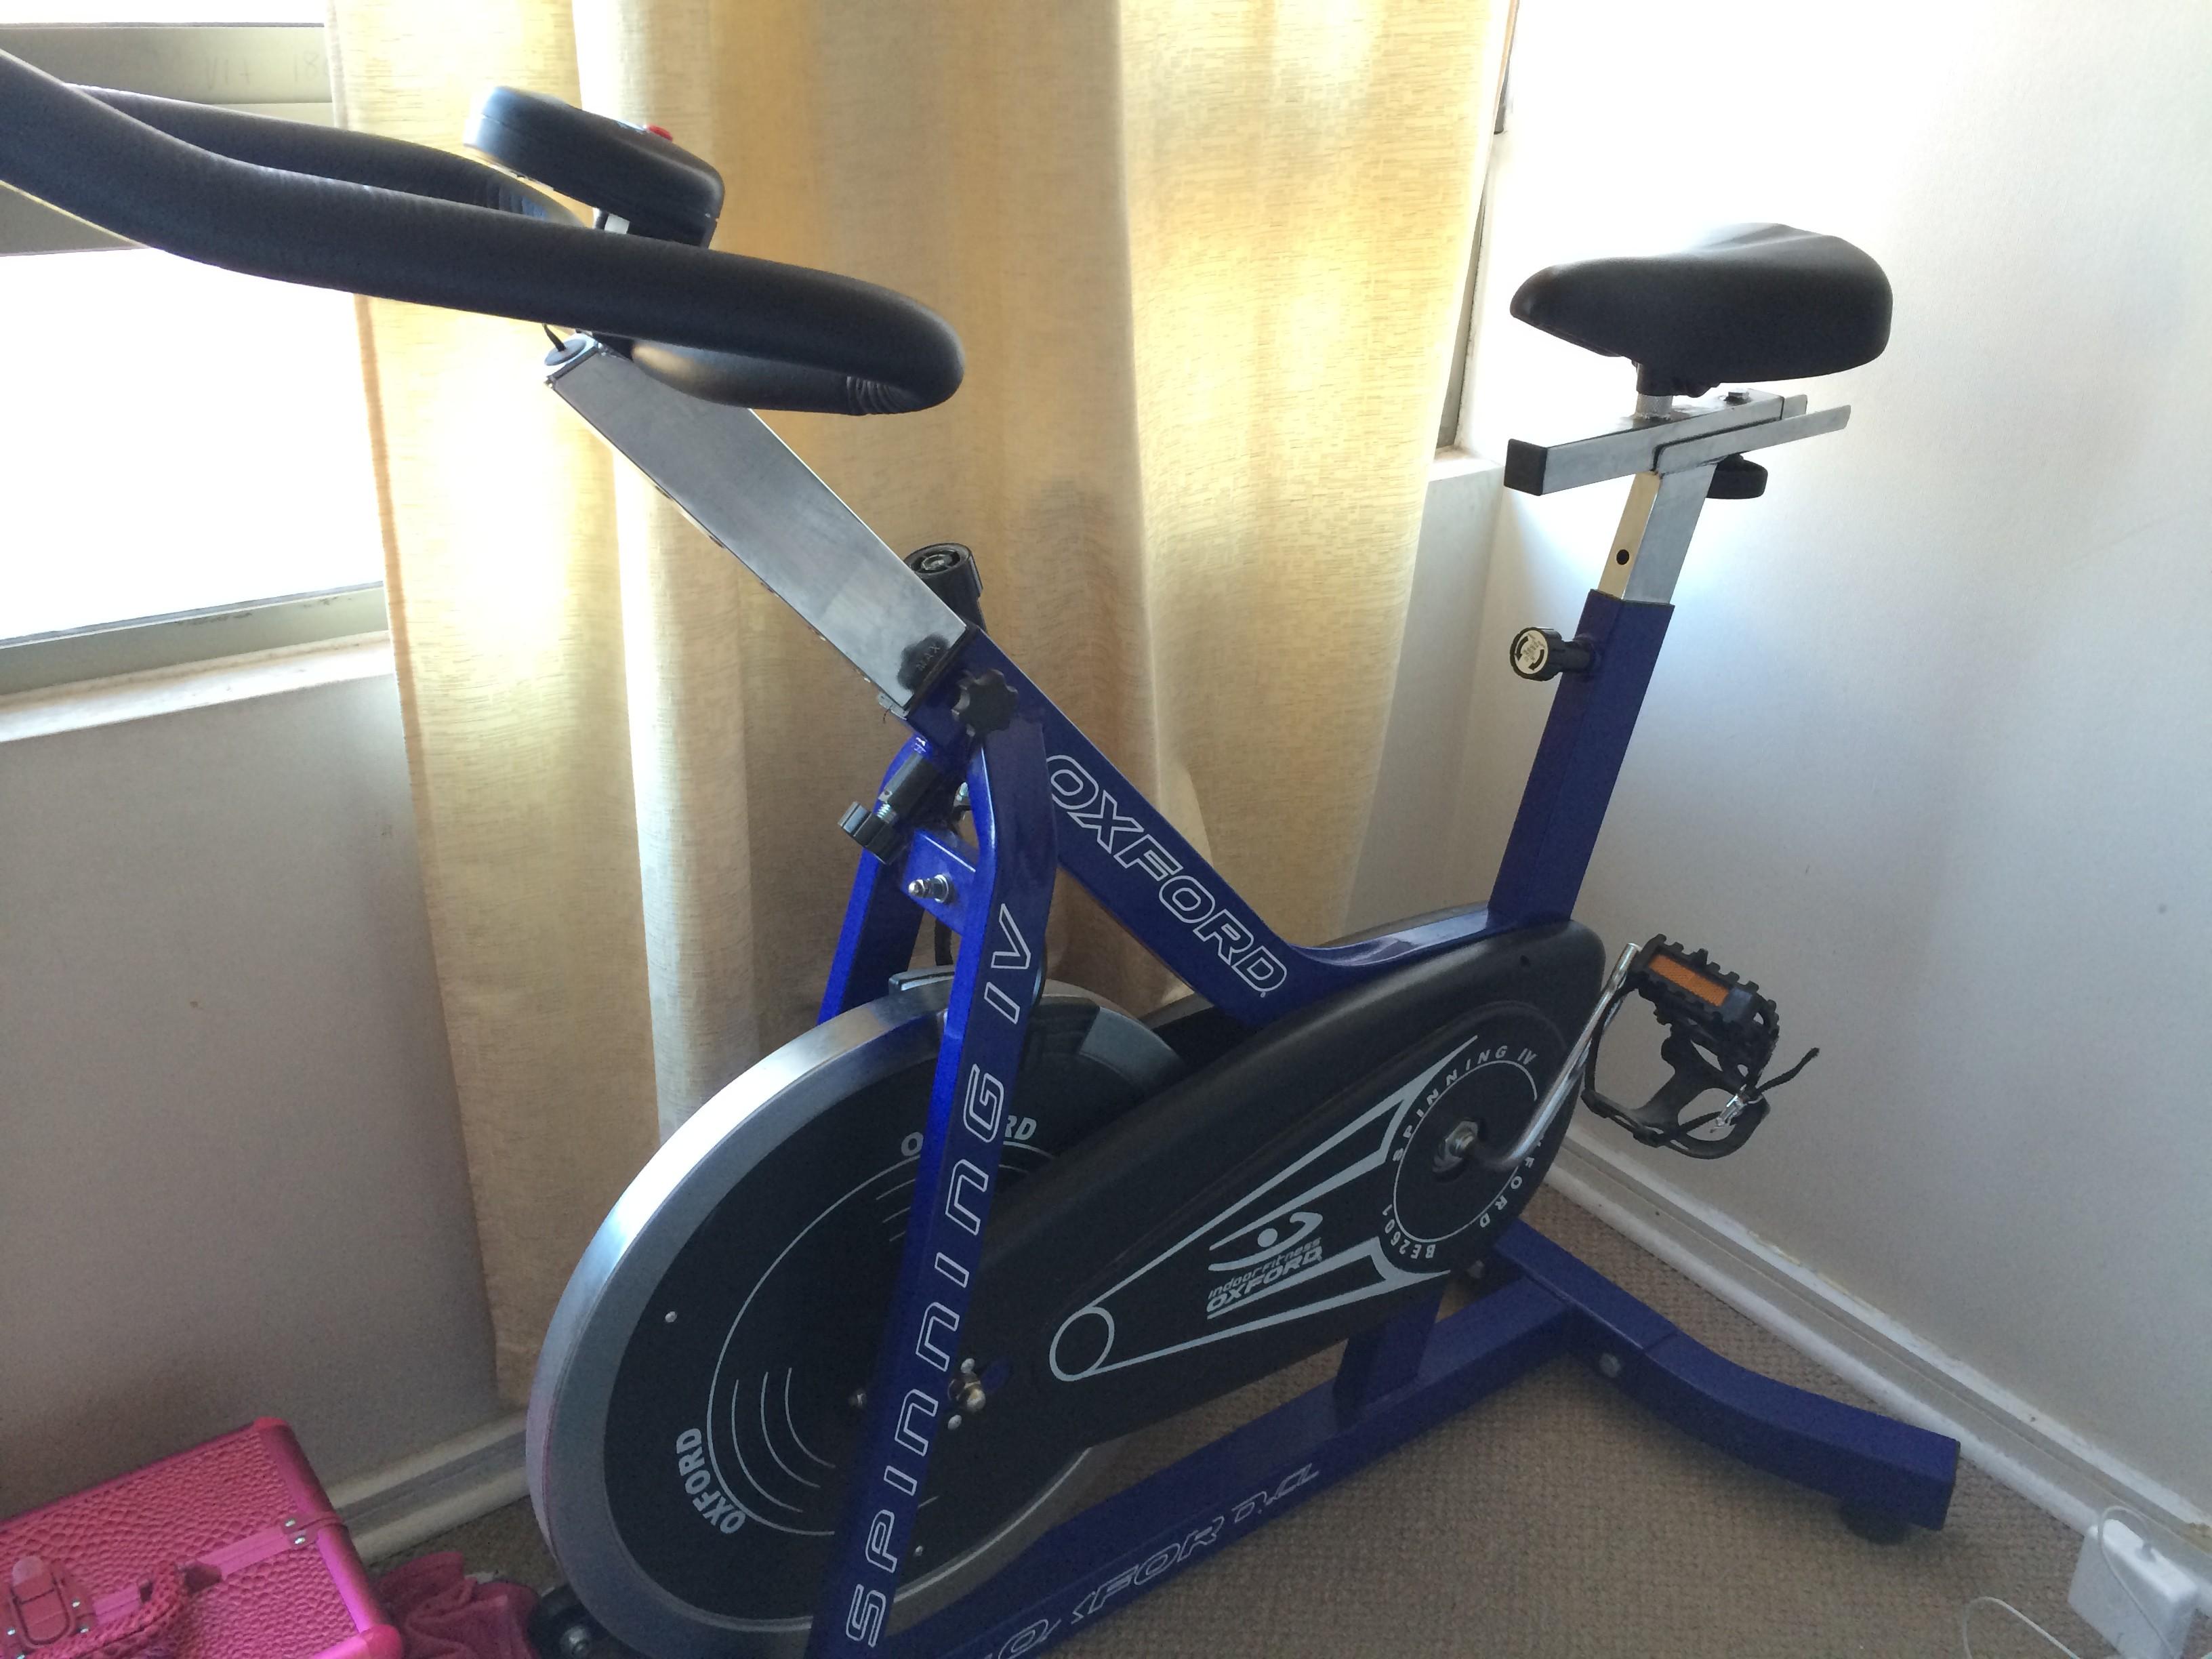 bici-spinning-e1398174614846